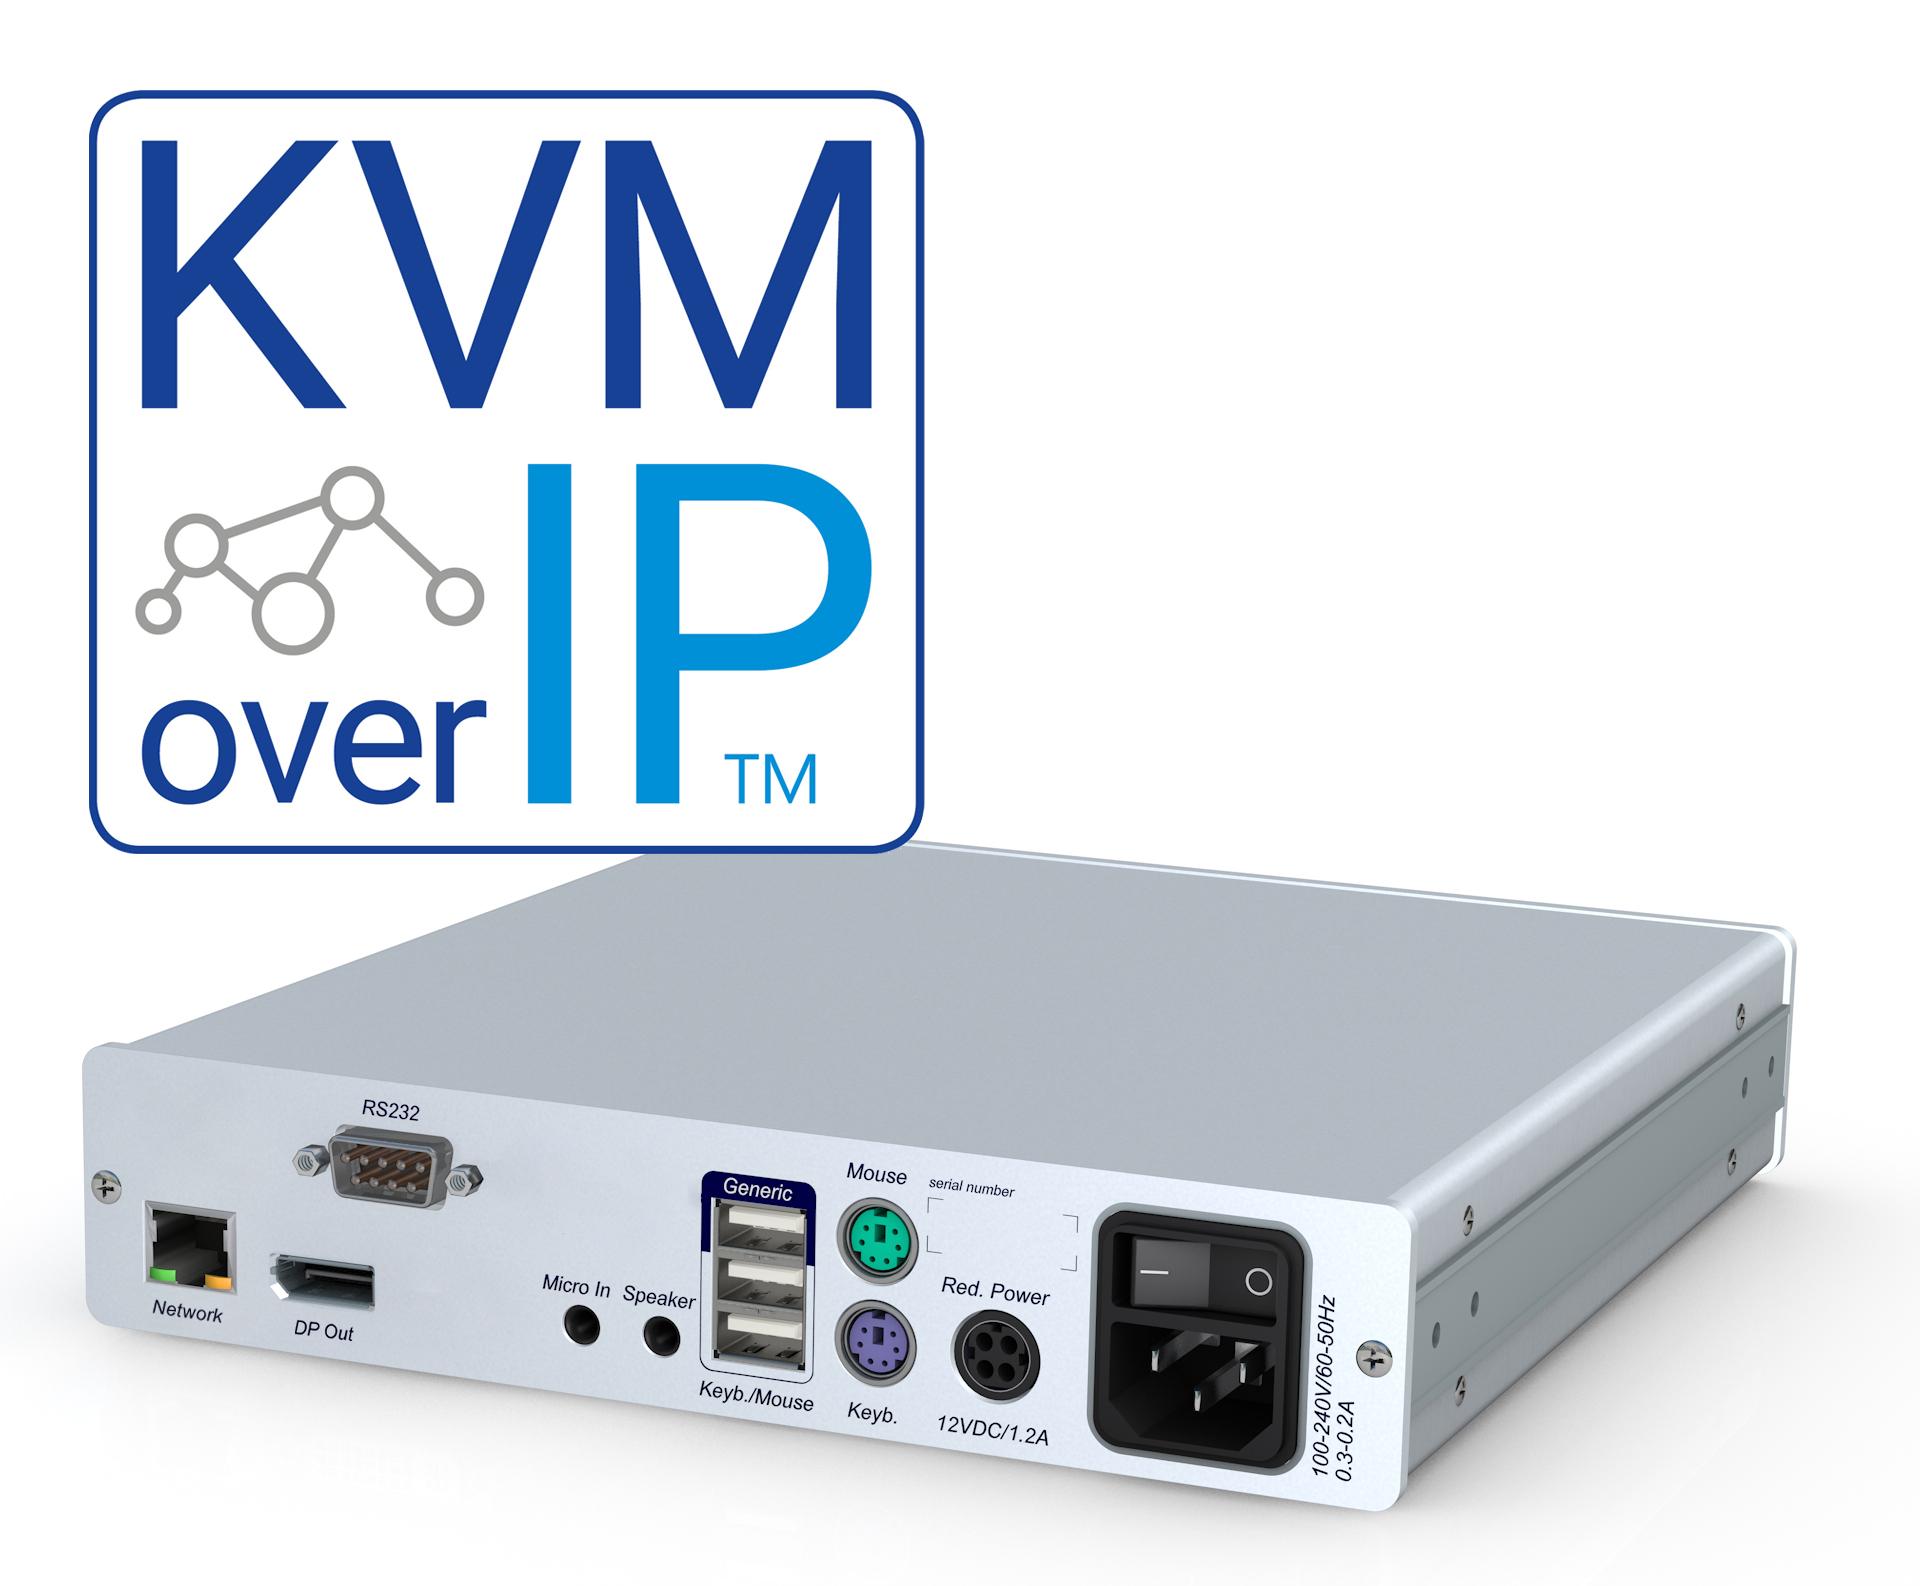 KVM over IP